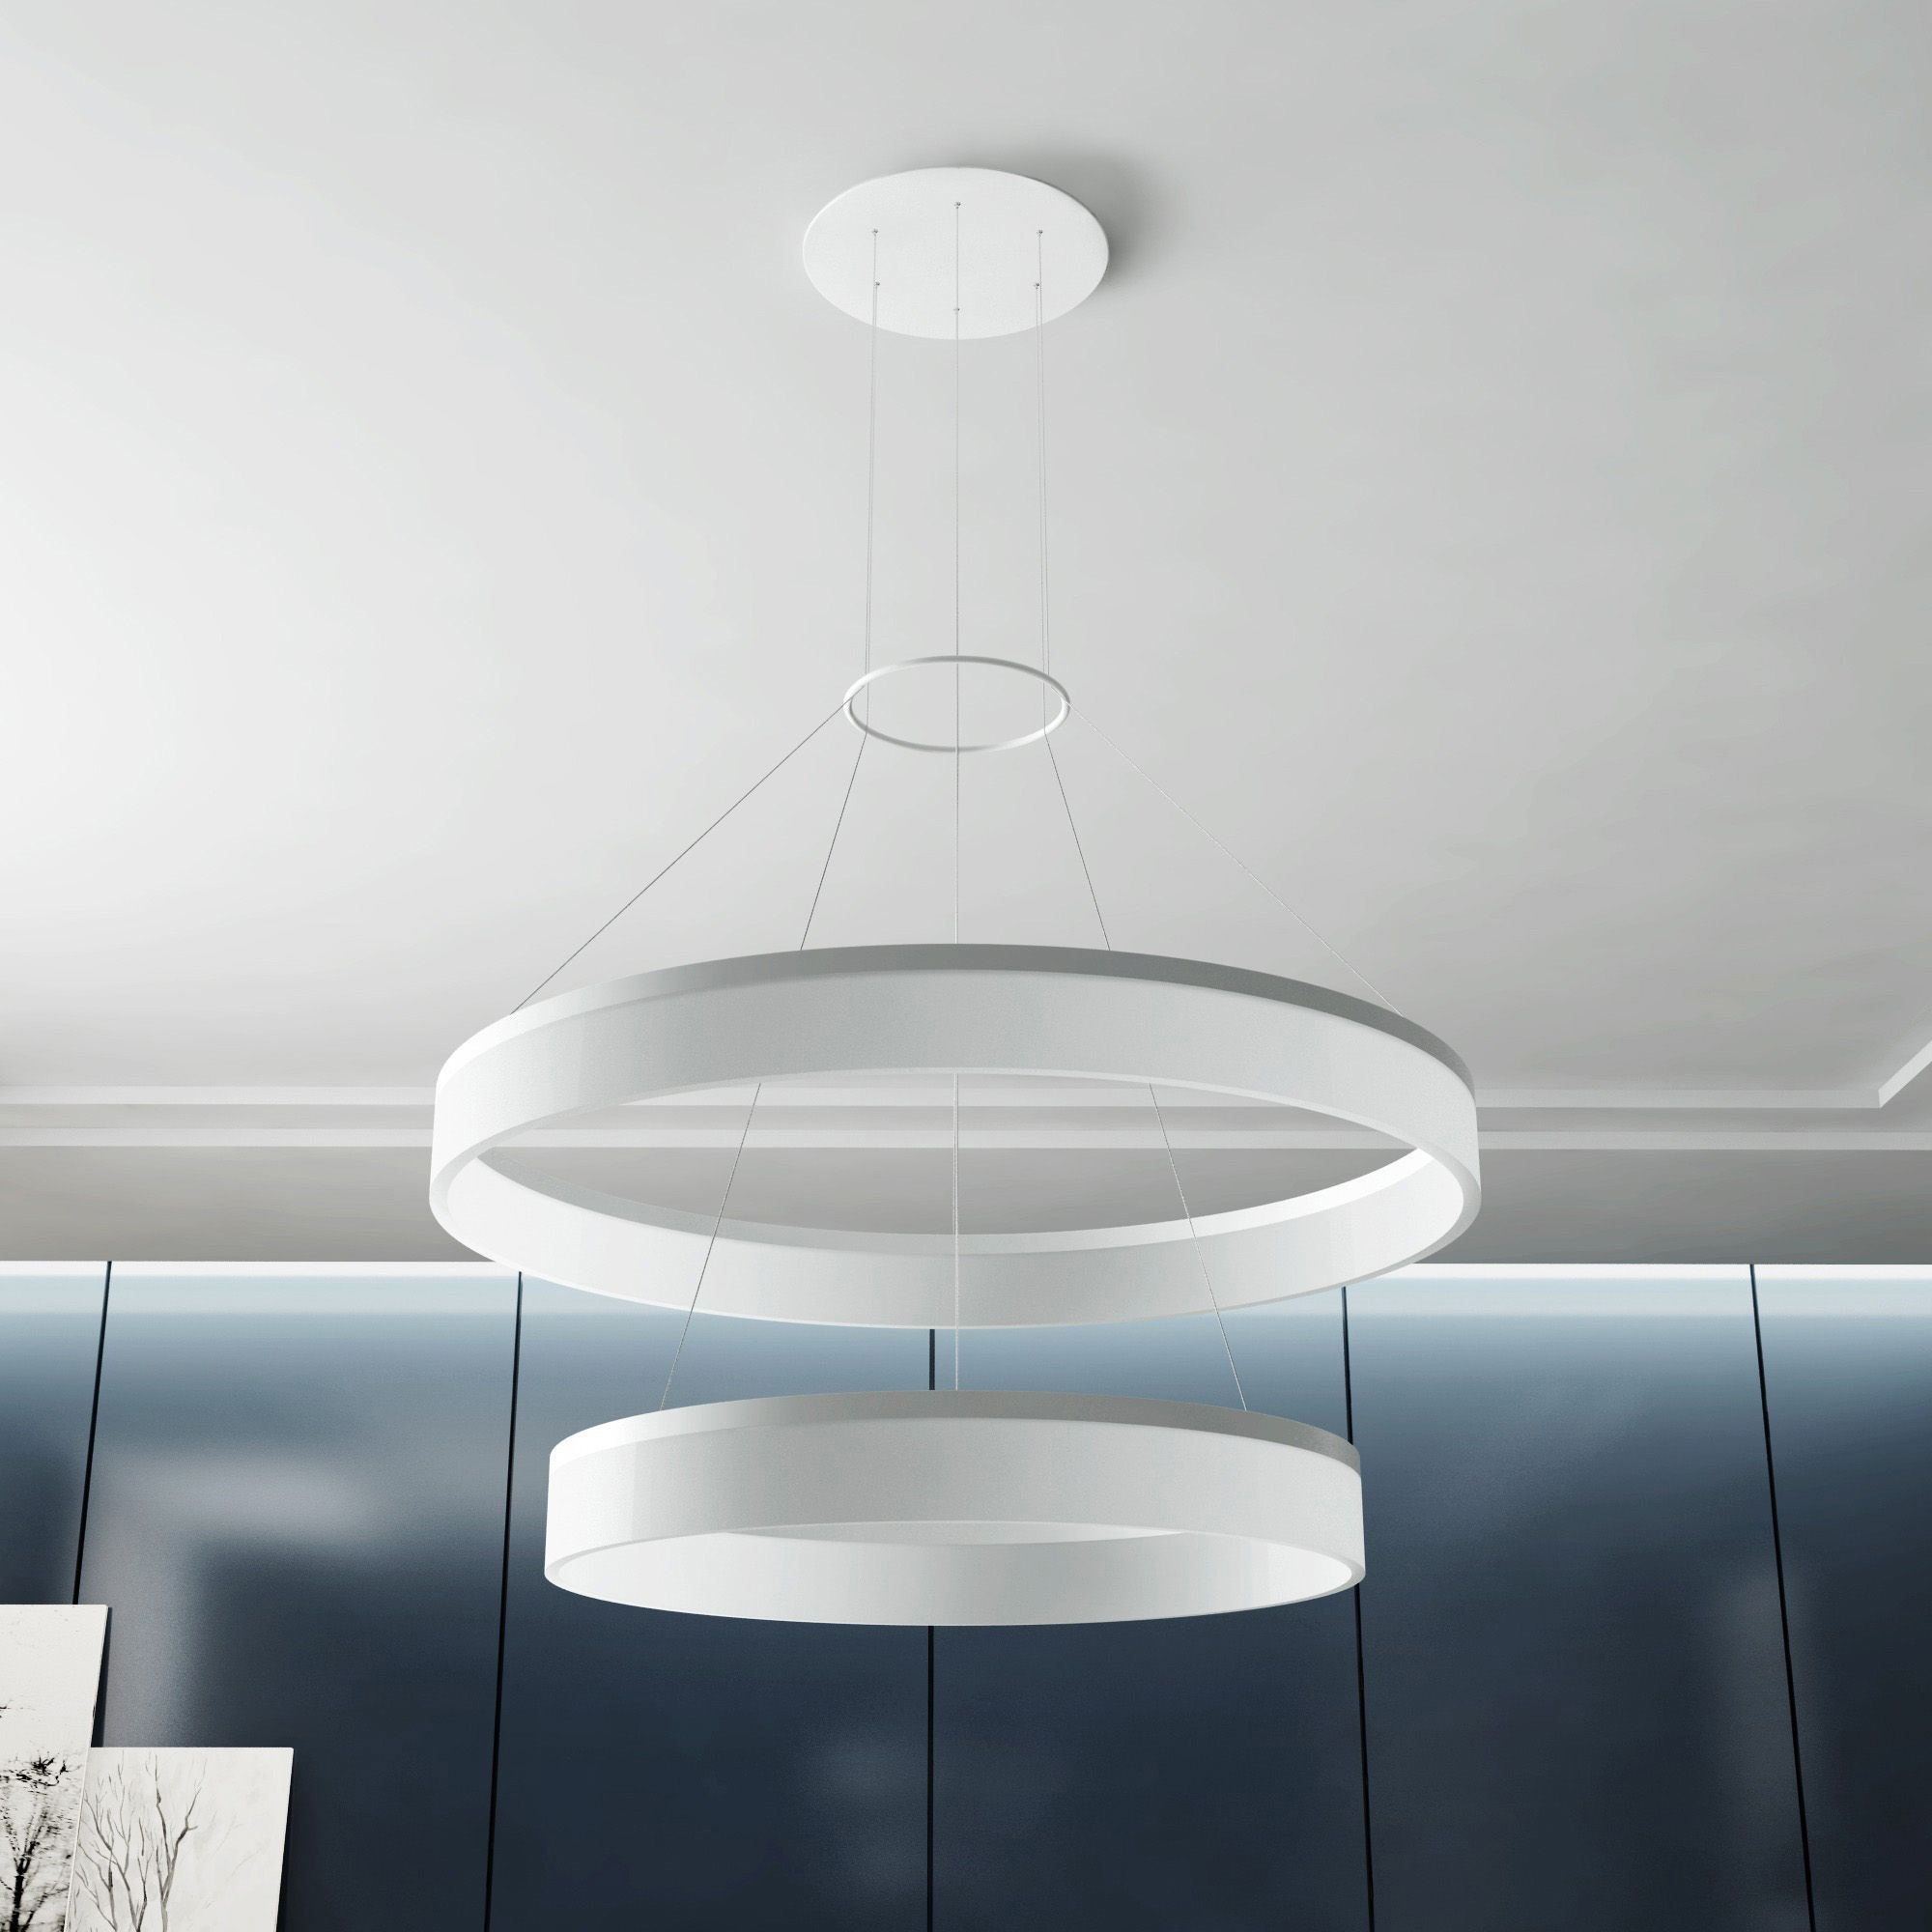 Vonn lighting tania duo 23 inch led two tier satin nickel orbicular lights arubaitofo Gallery